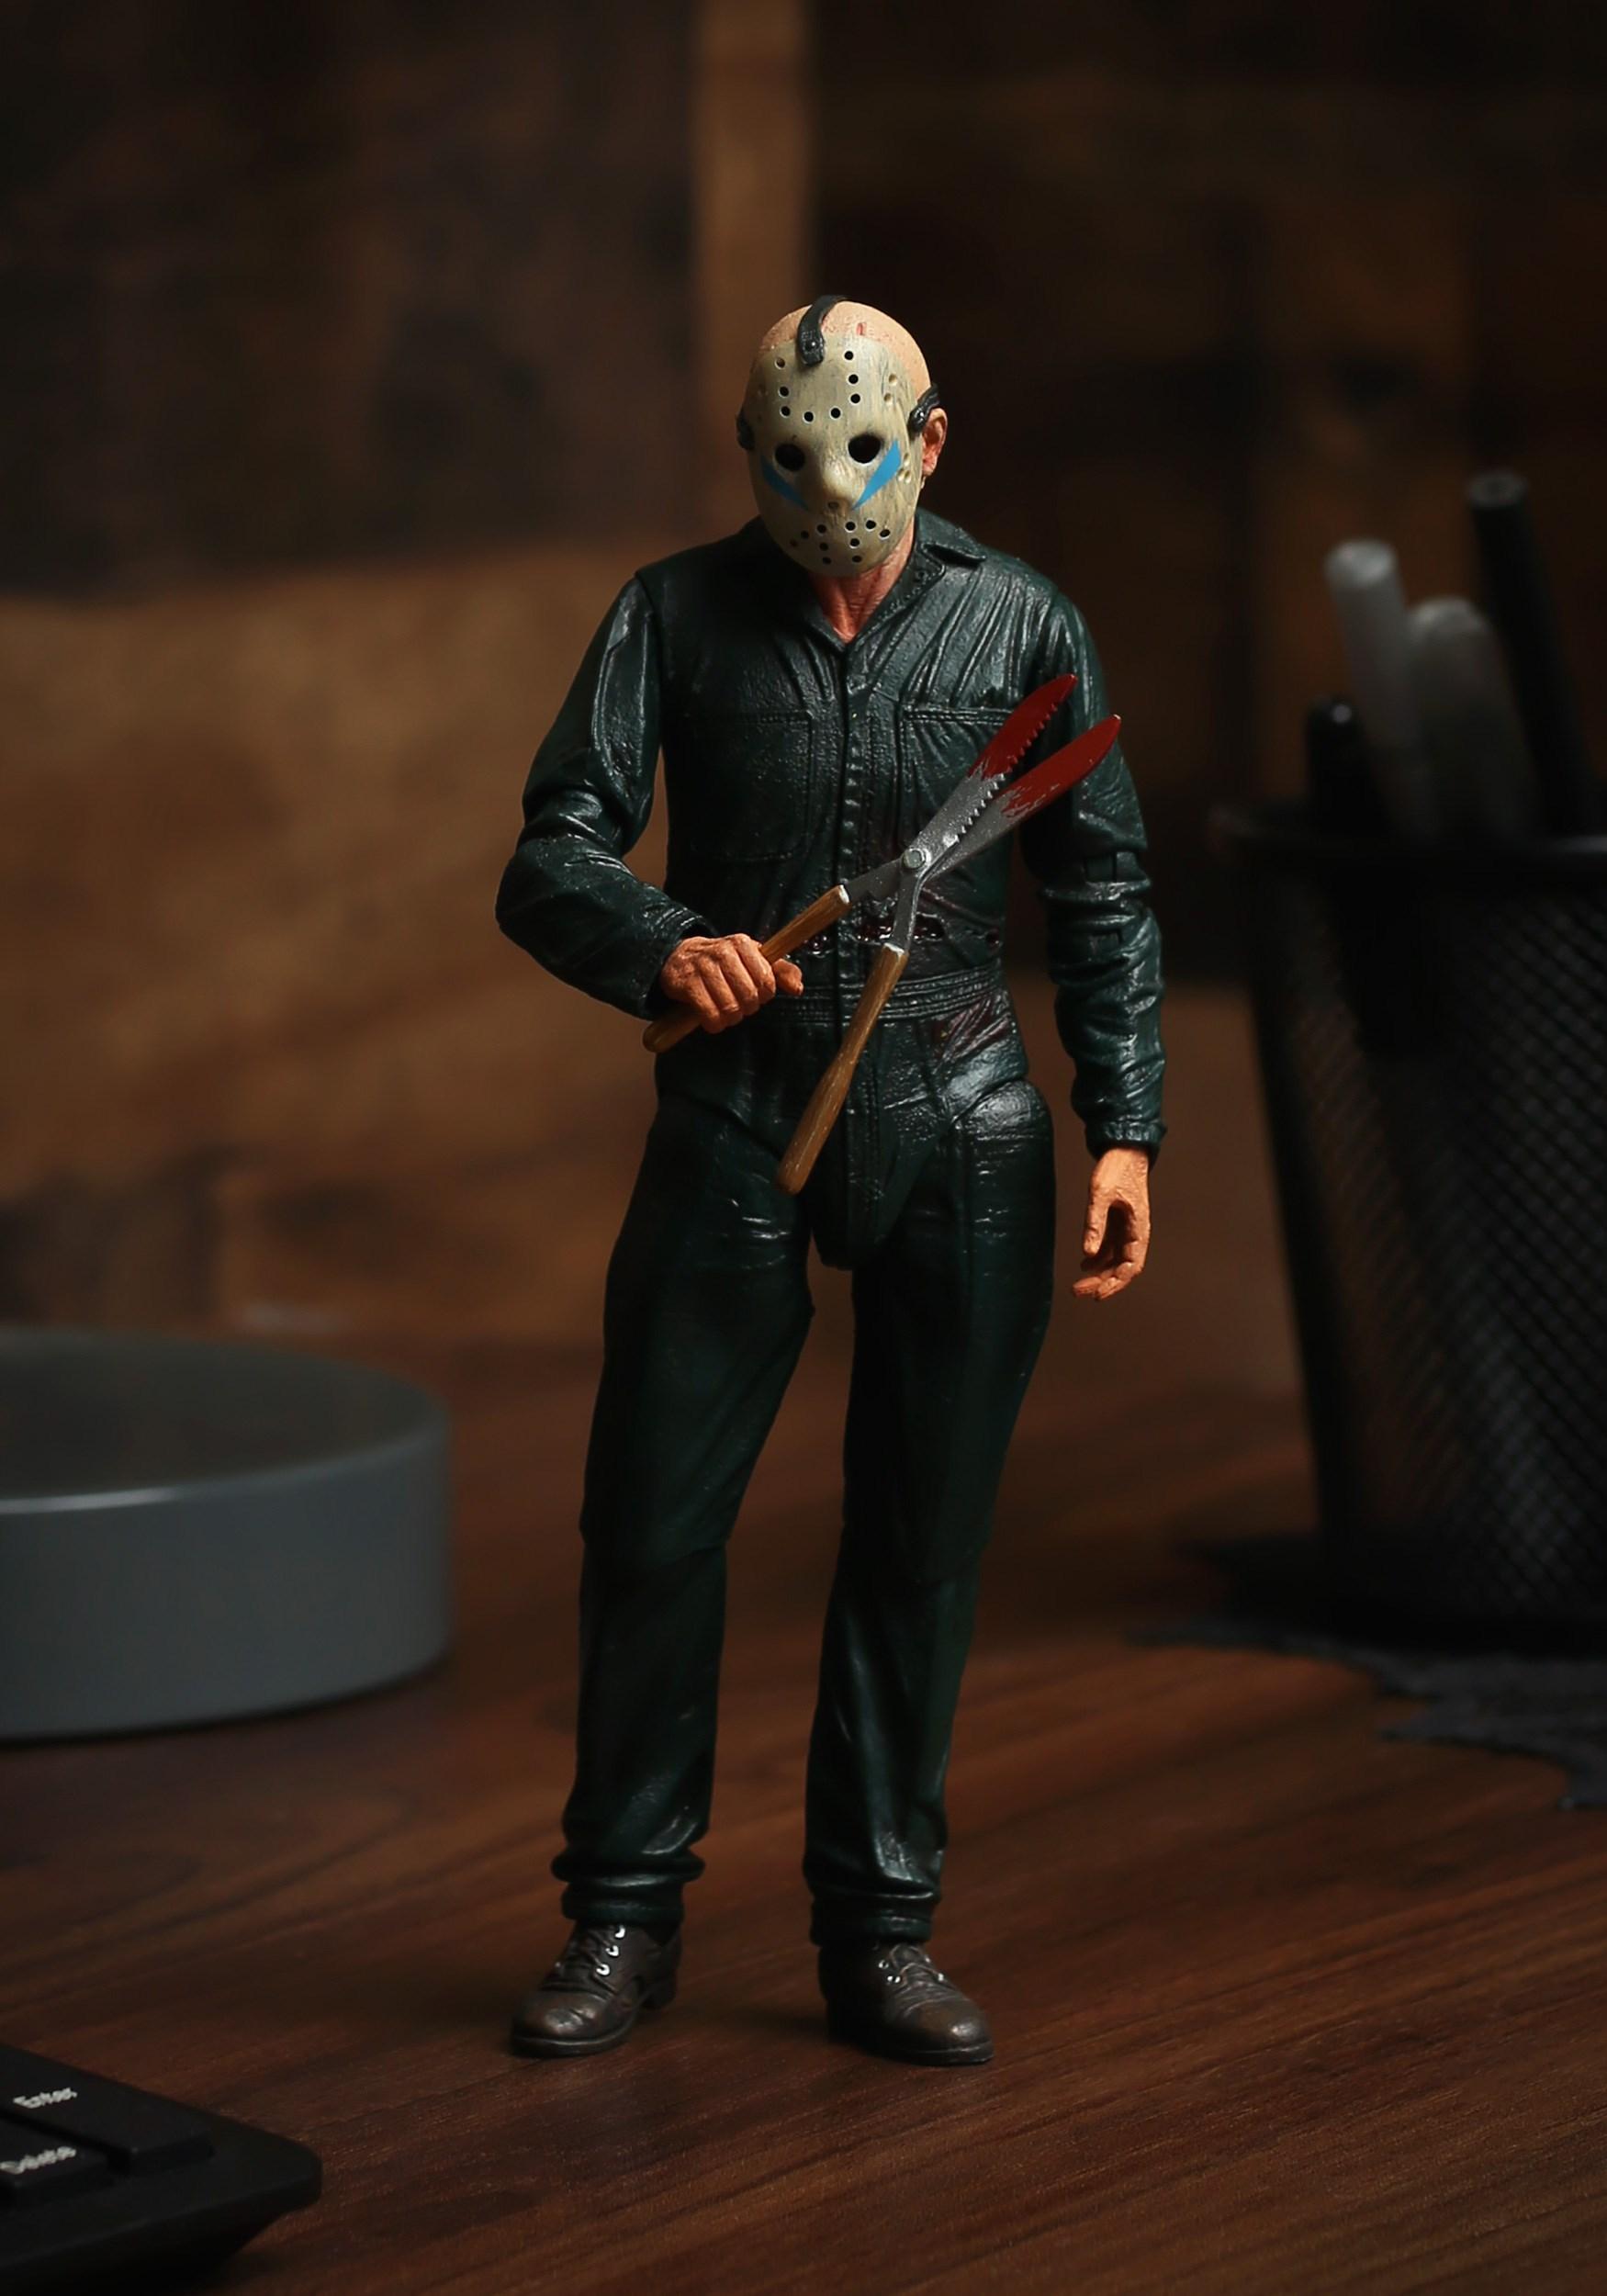 Roy Burns Jason 7 U0026quot  Scale Action Figure Friday The 13th Part 5